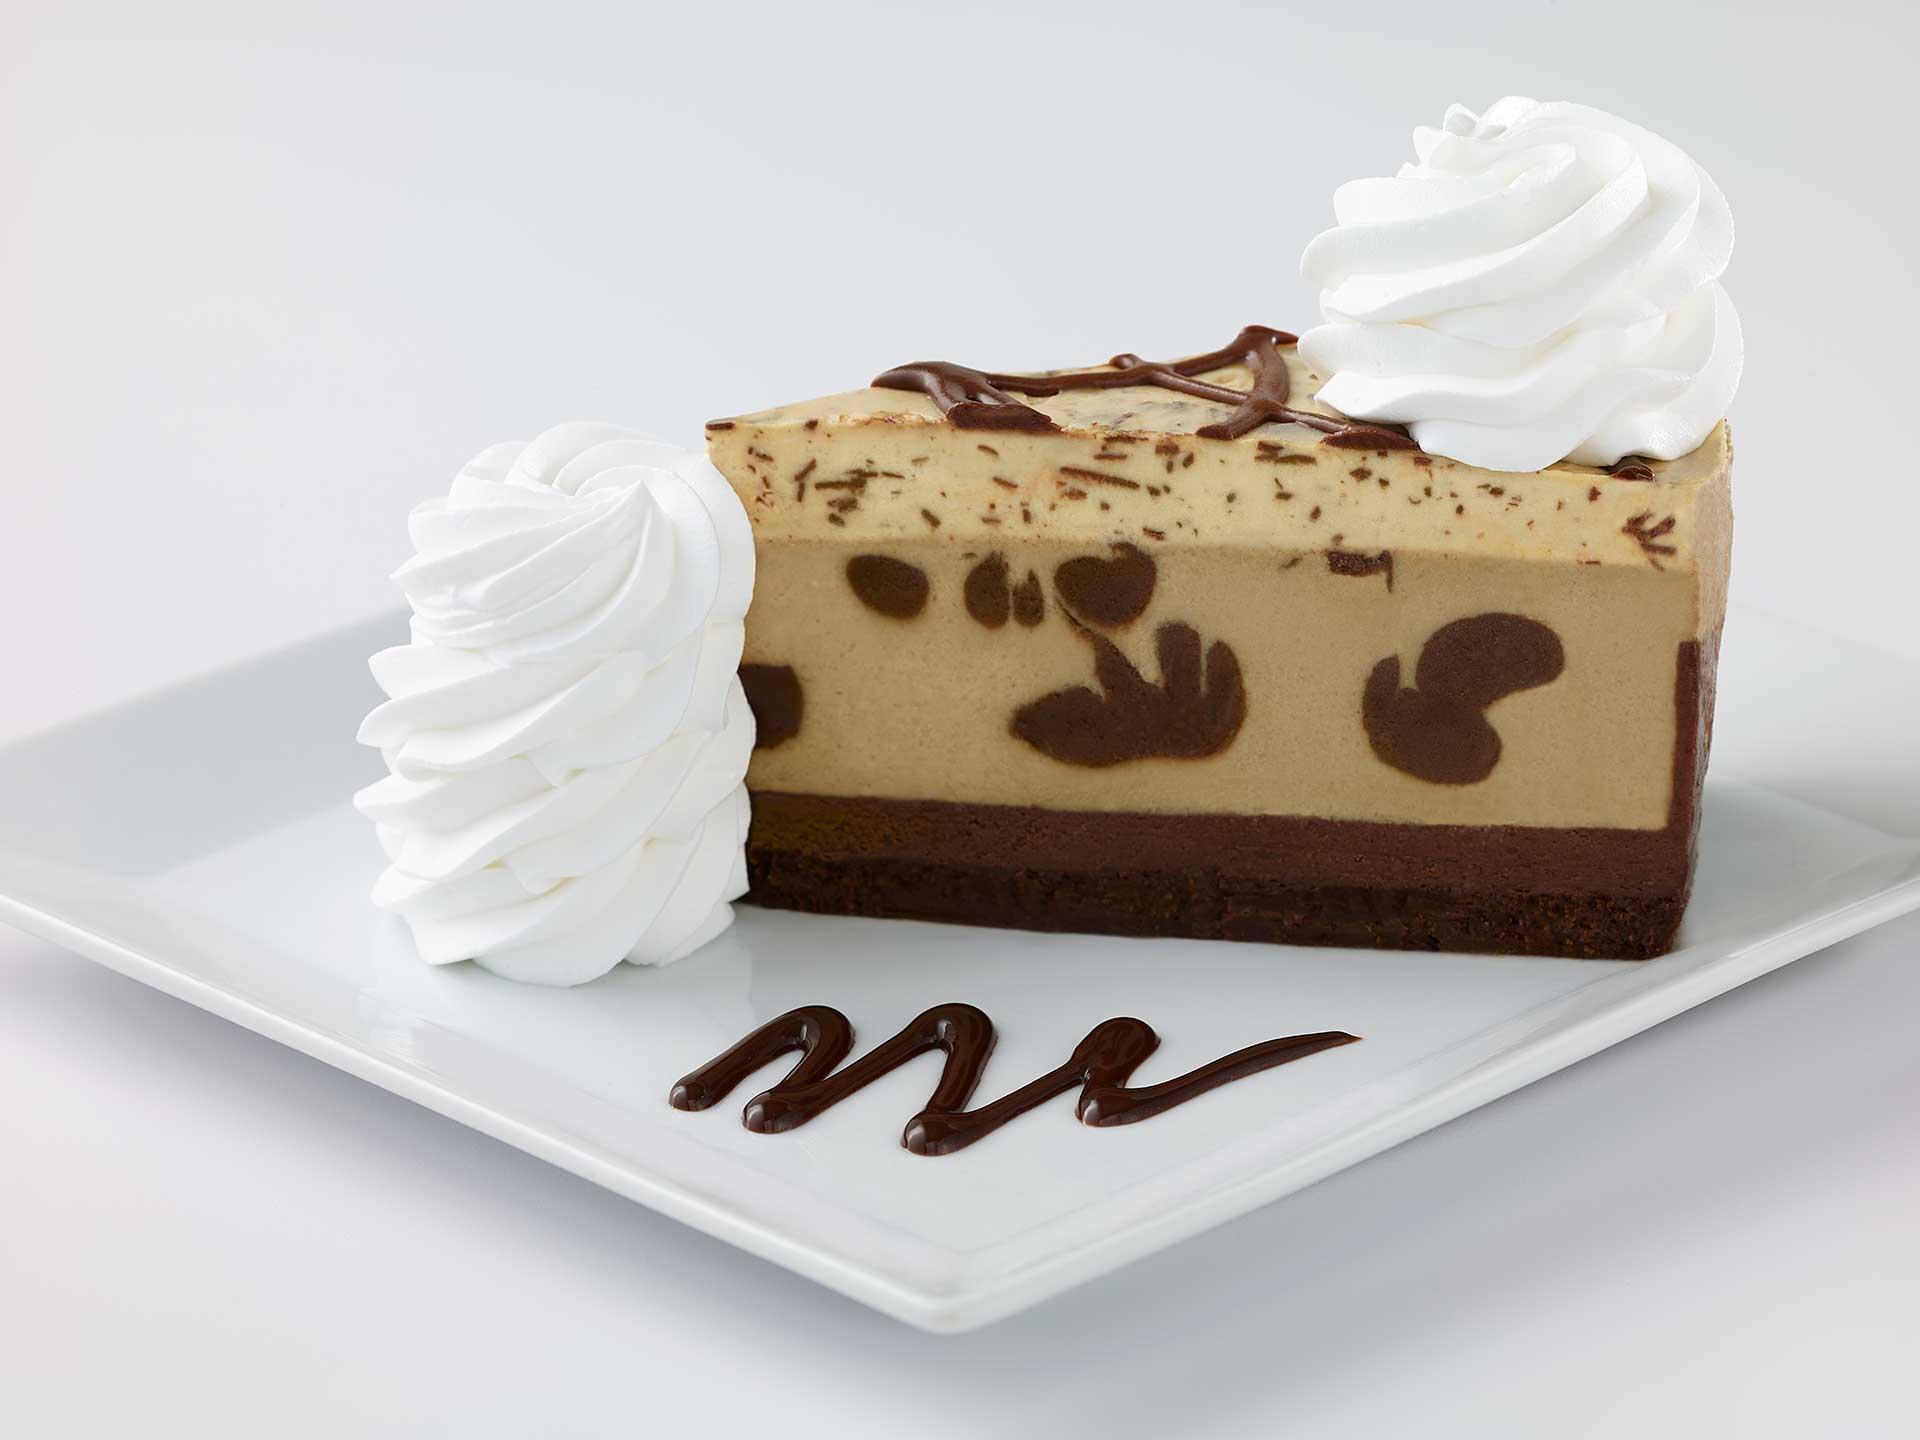 Cheesecake and coffee photo